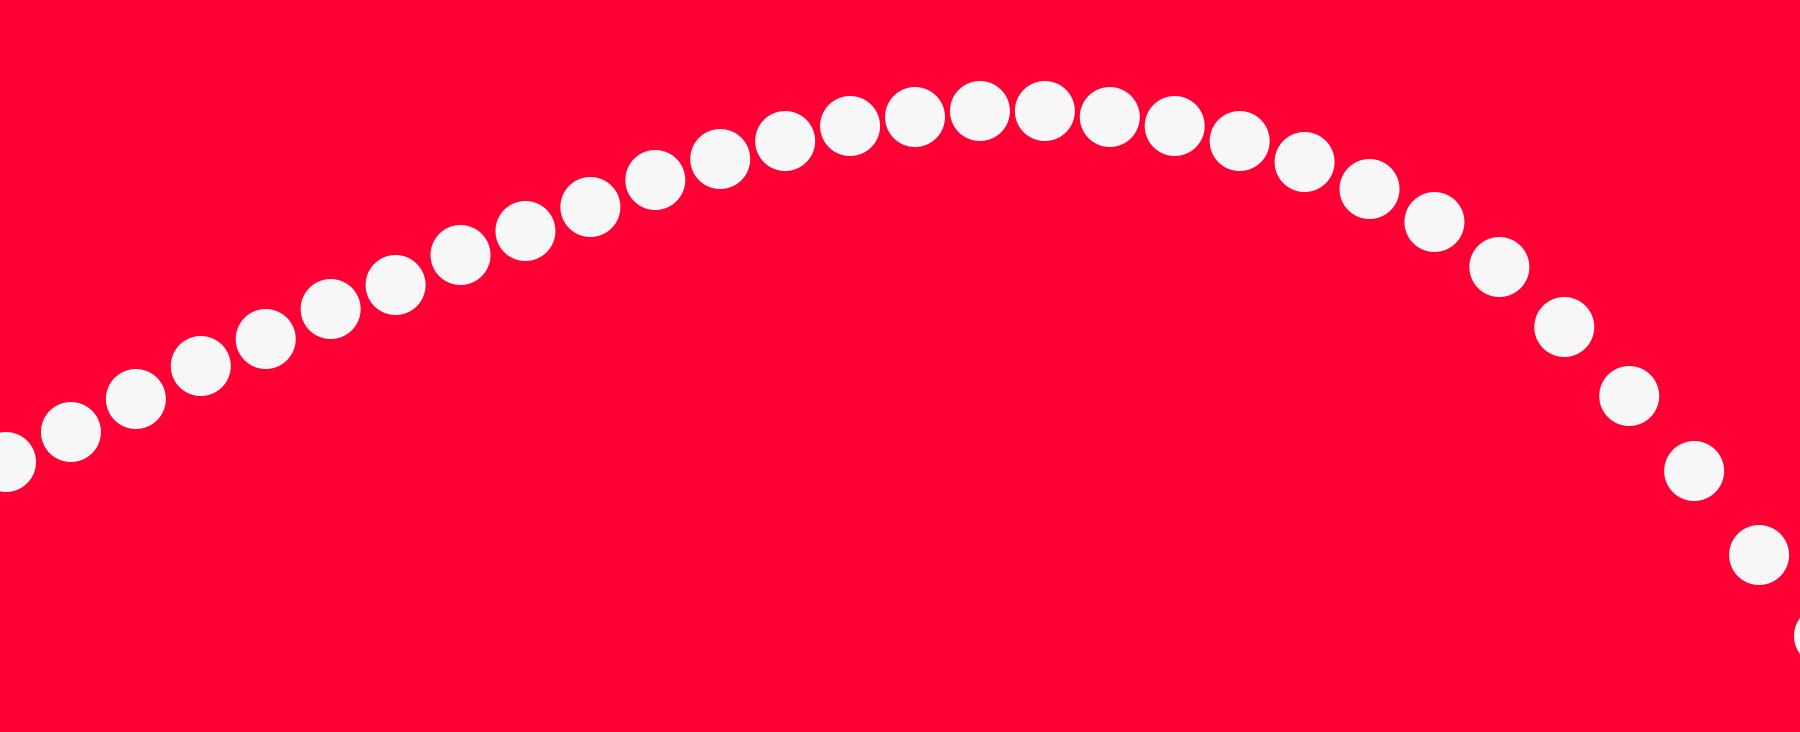 AbstractGoal